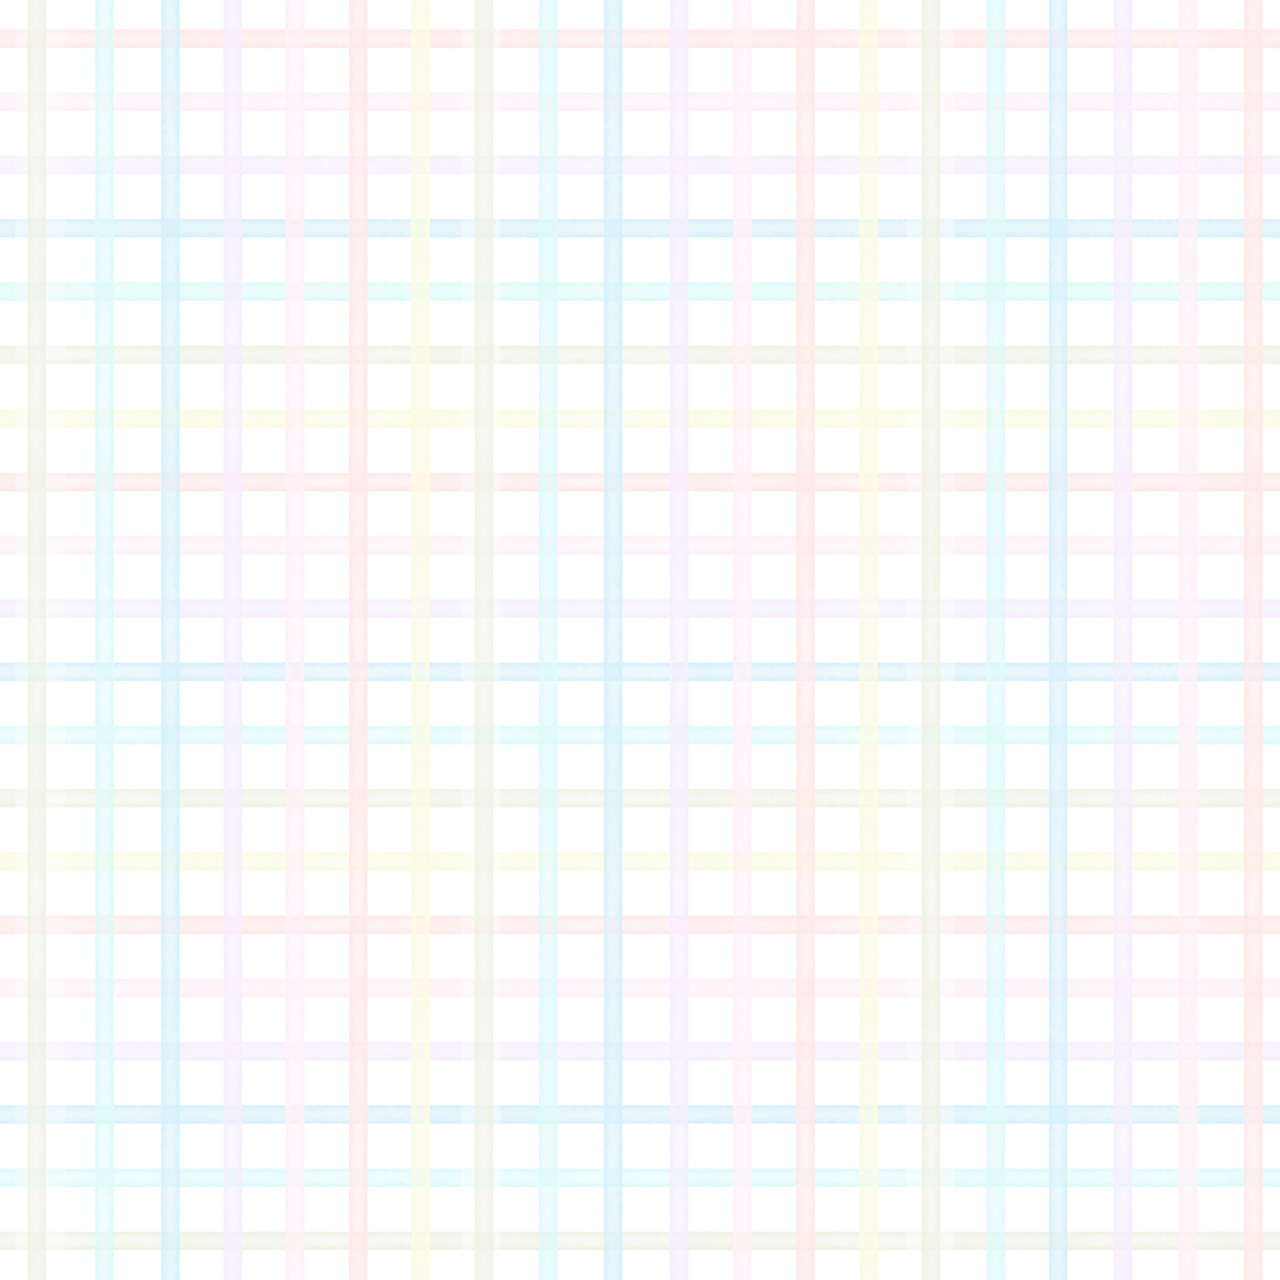 Papel de Parede Quadriculado Didi - Candy Colors